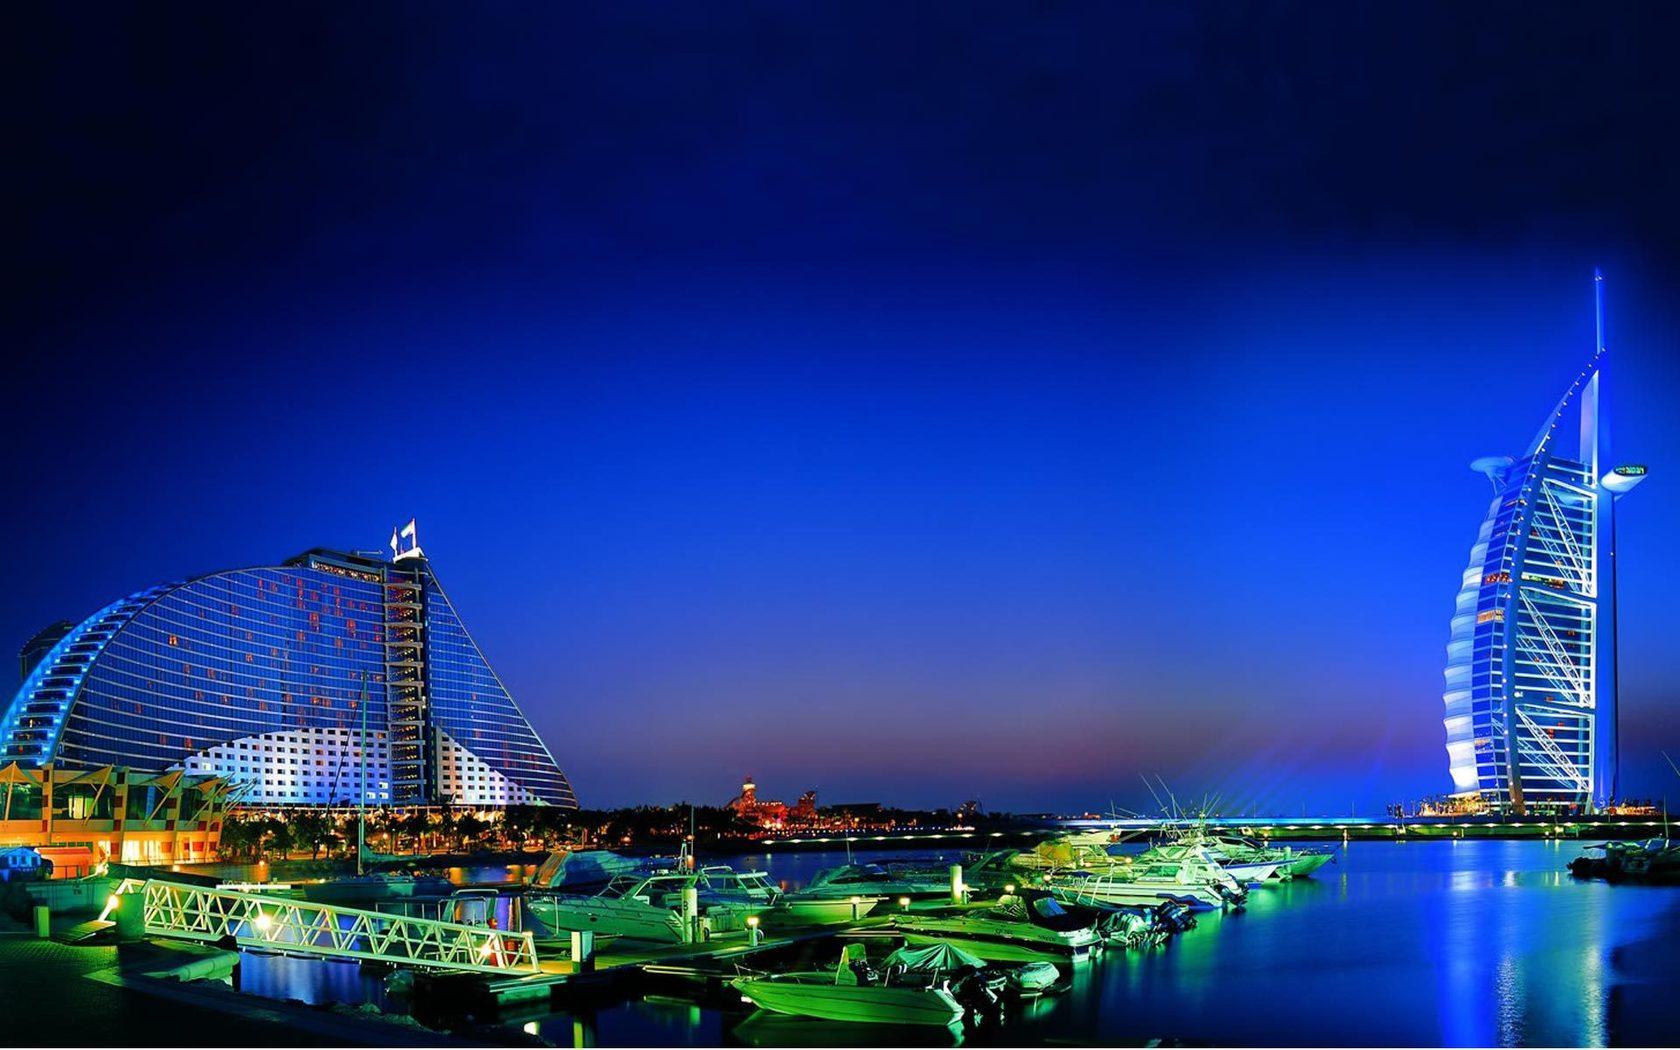 Dubai Night View Wallpaper Background Hd Wallpaper